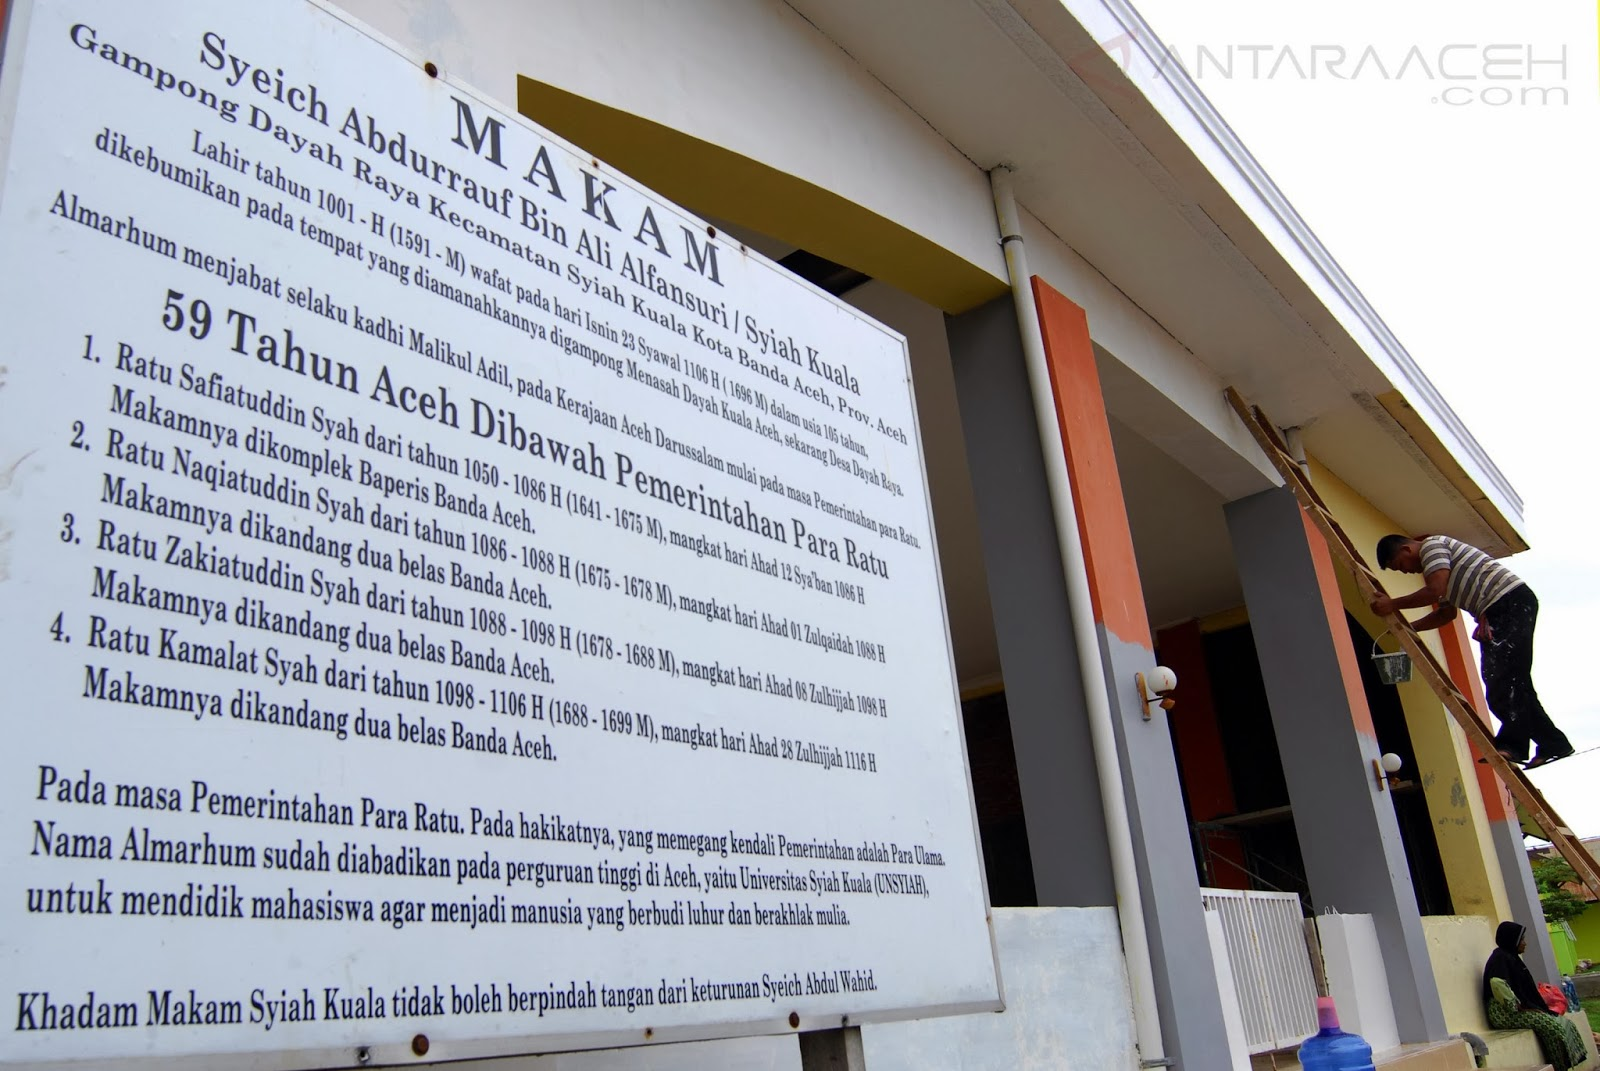 Perawatan Situs Syiah Kuala Antara Aceh Makam Ulama Besar Syeich